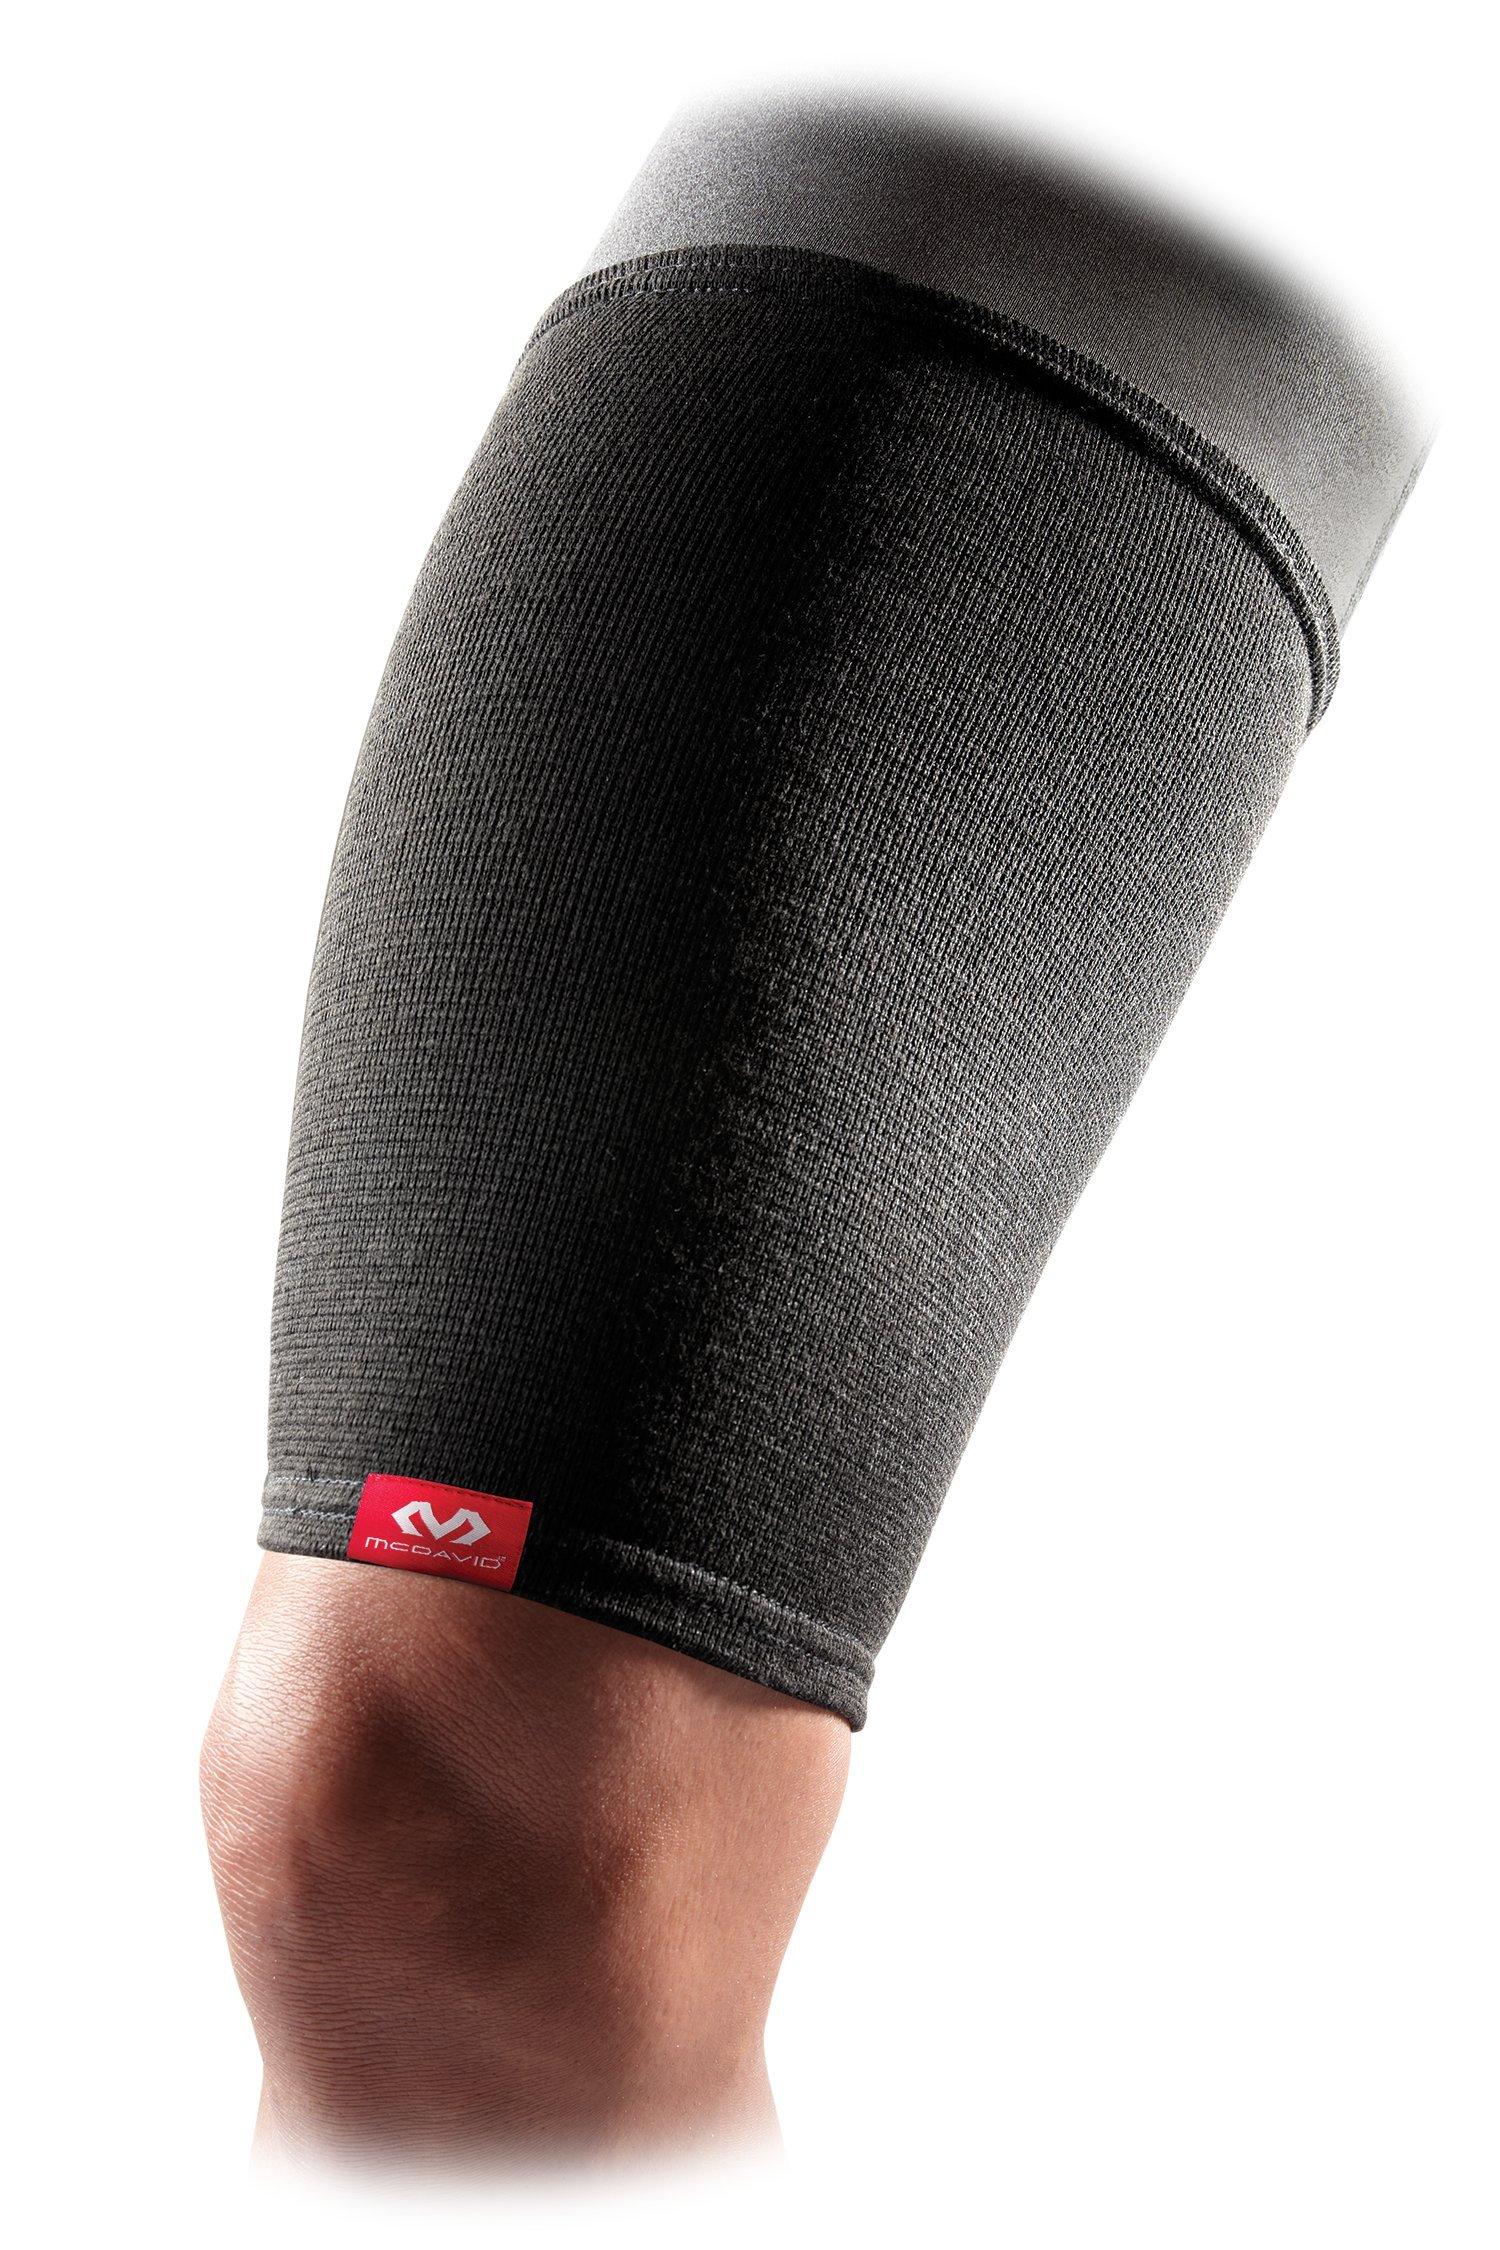 McDavid 514R Level 1 Elastic Thigh Sleeve, Black by McDavid